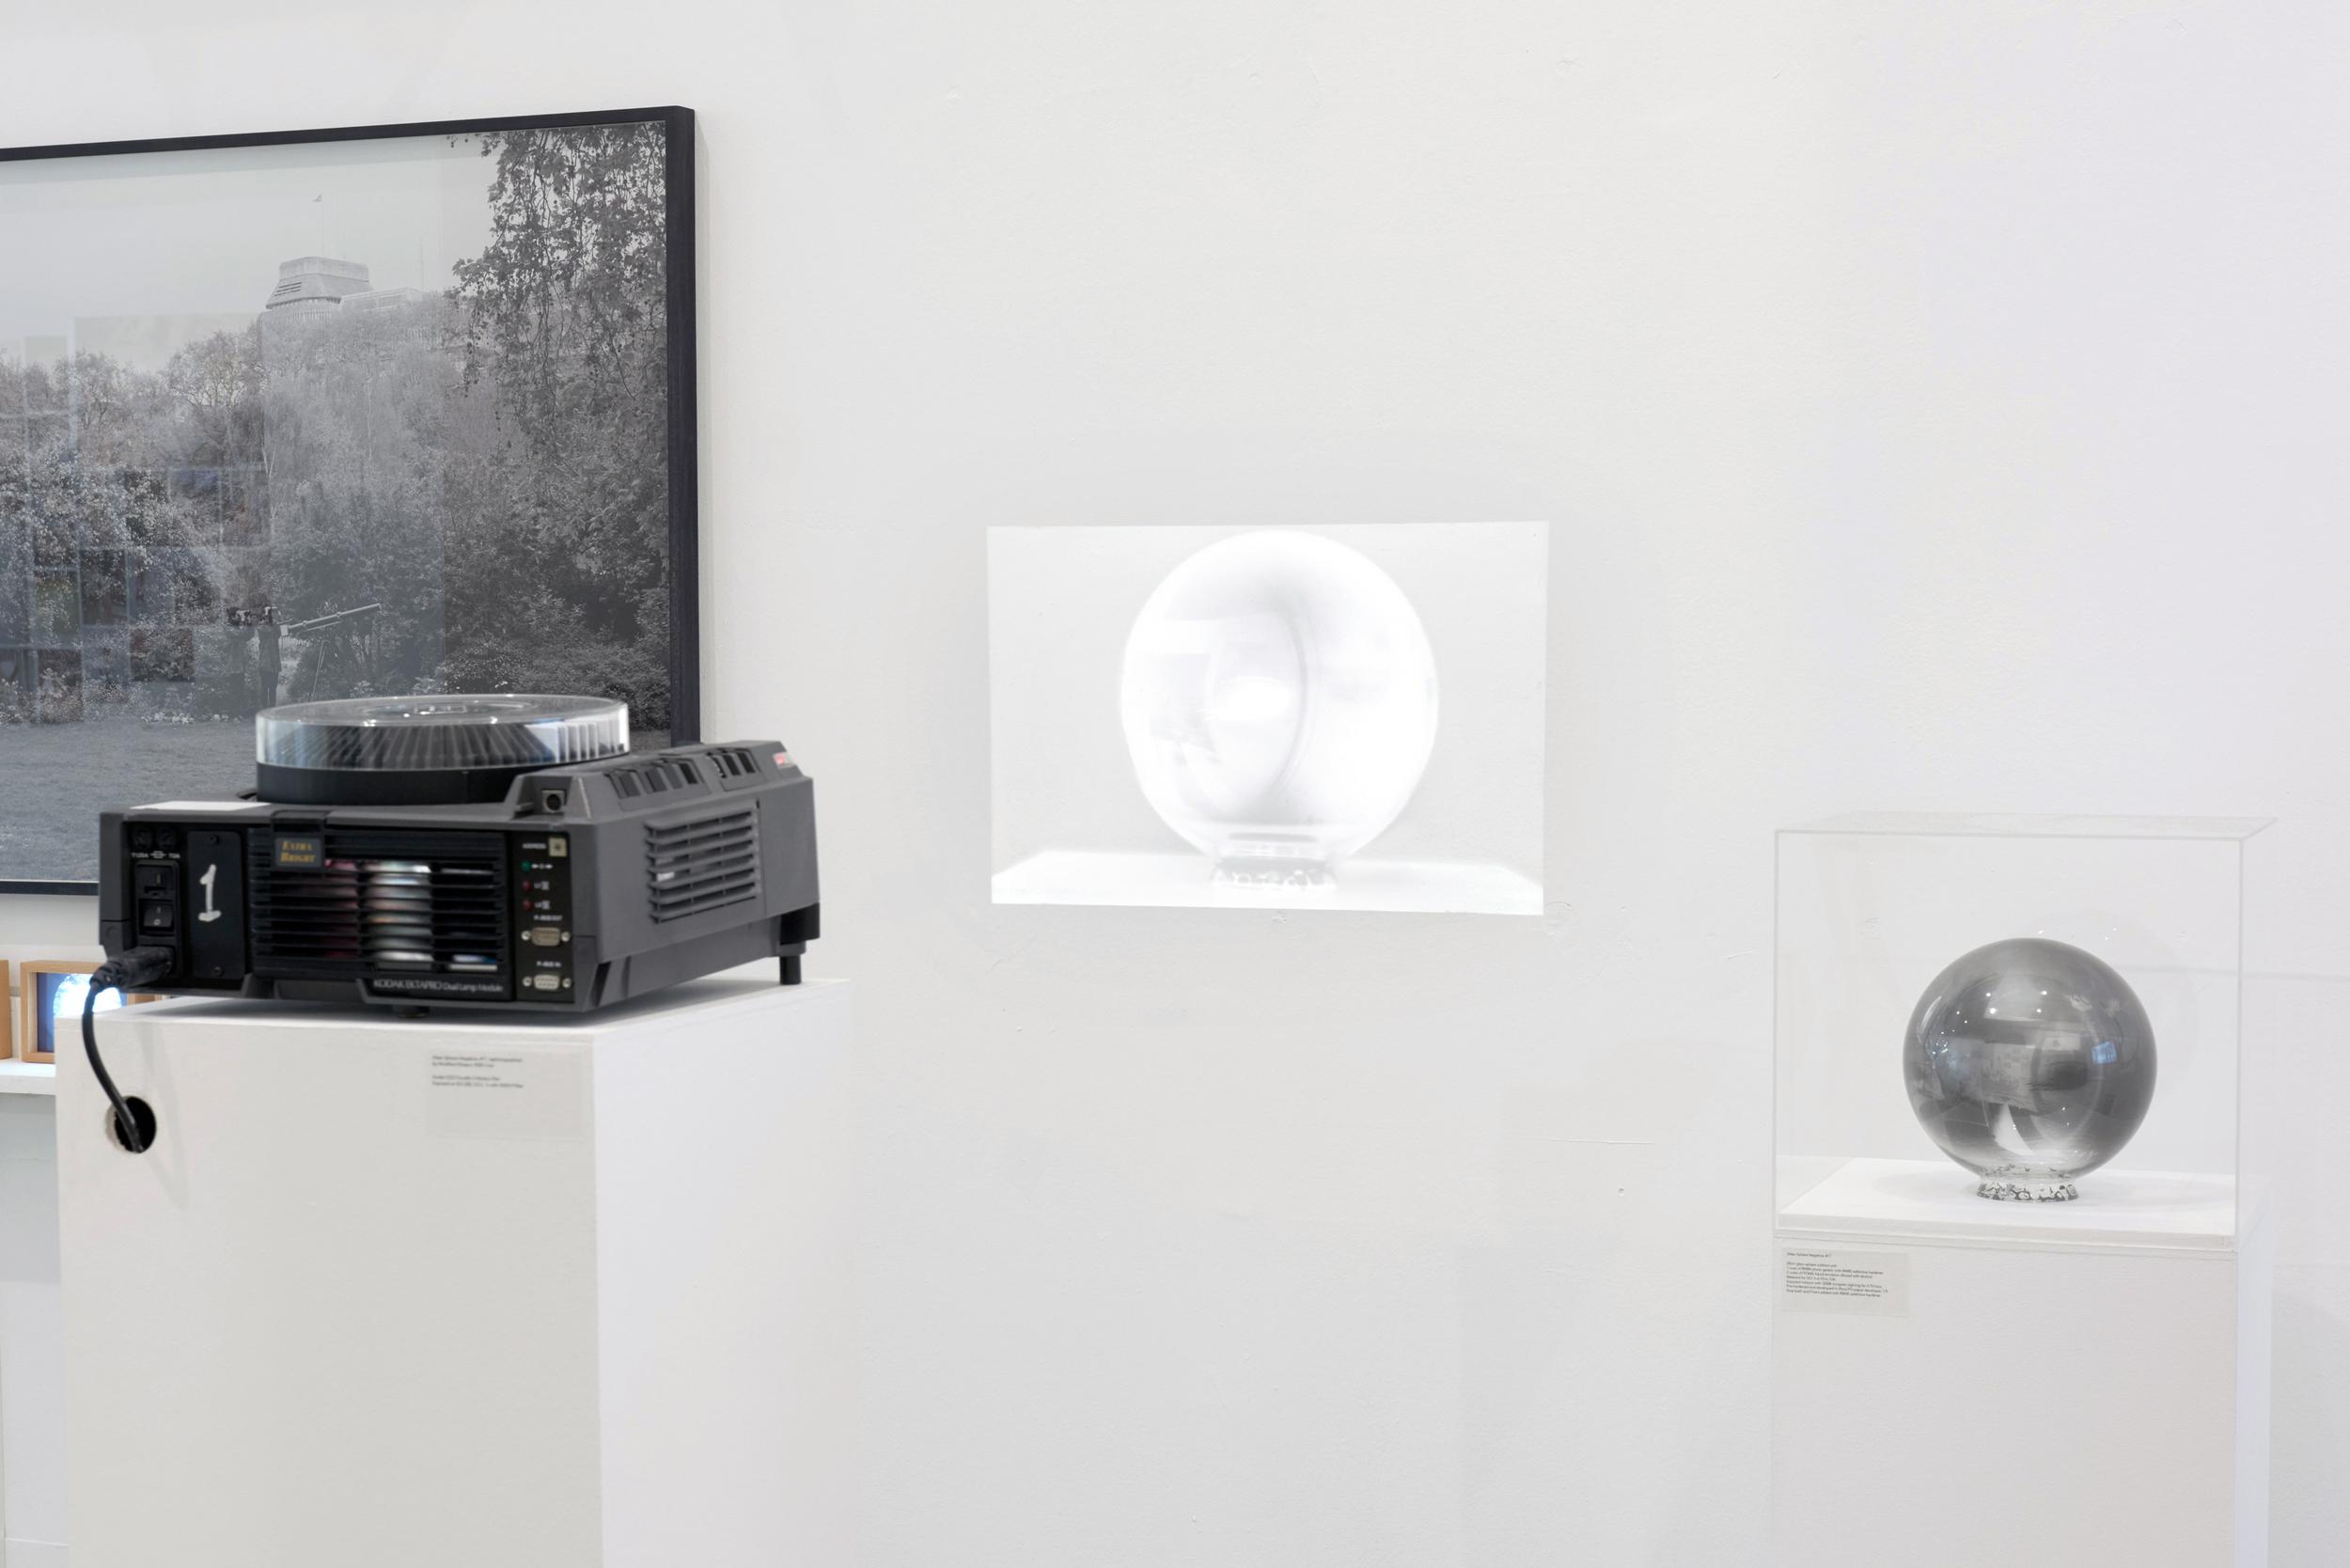 Kodak Ektapro 9020 Cine Projecting Slides of the Rephotographed 3D Negative